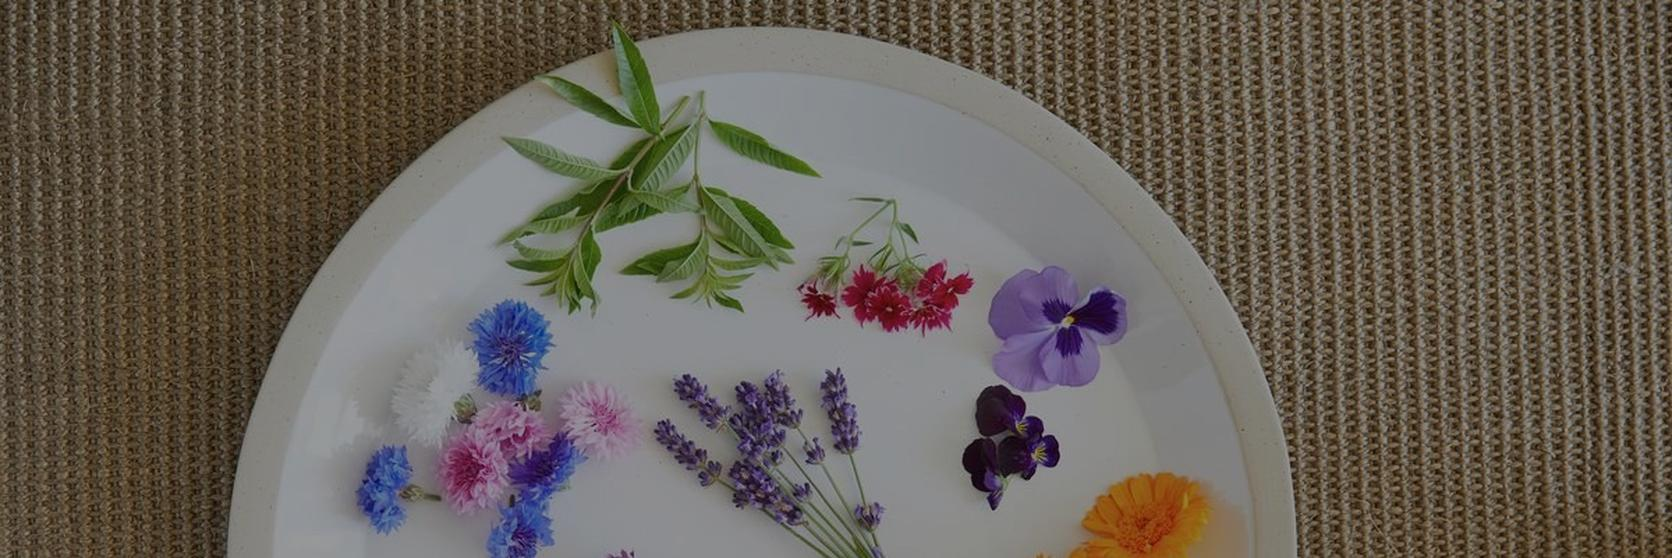 Edible-flowers-guide